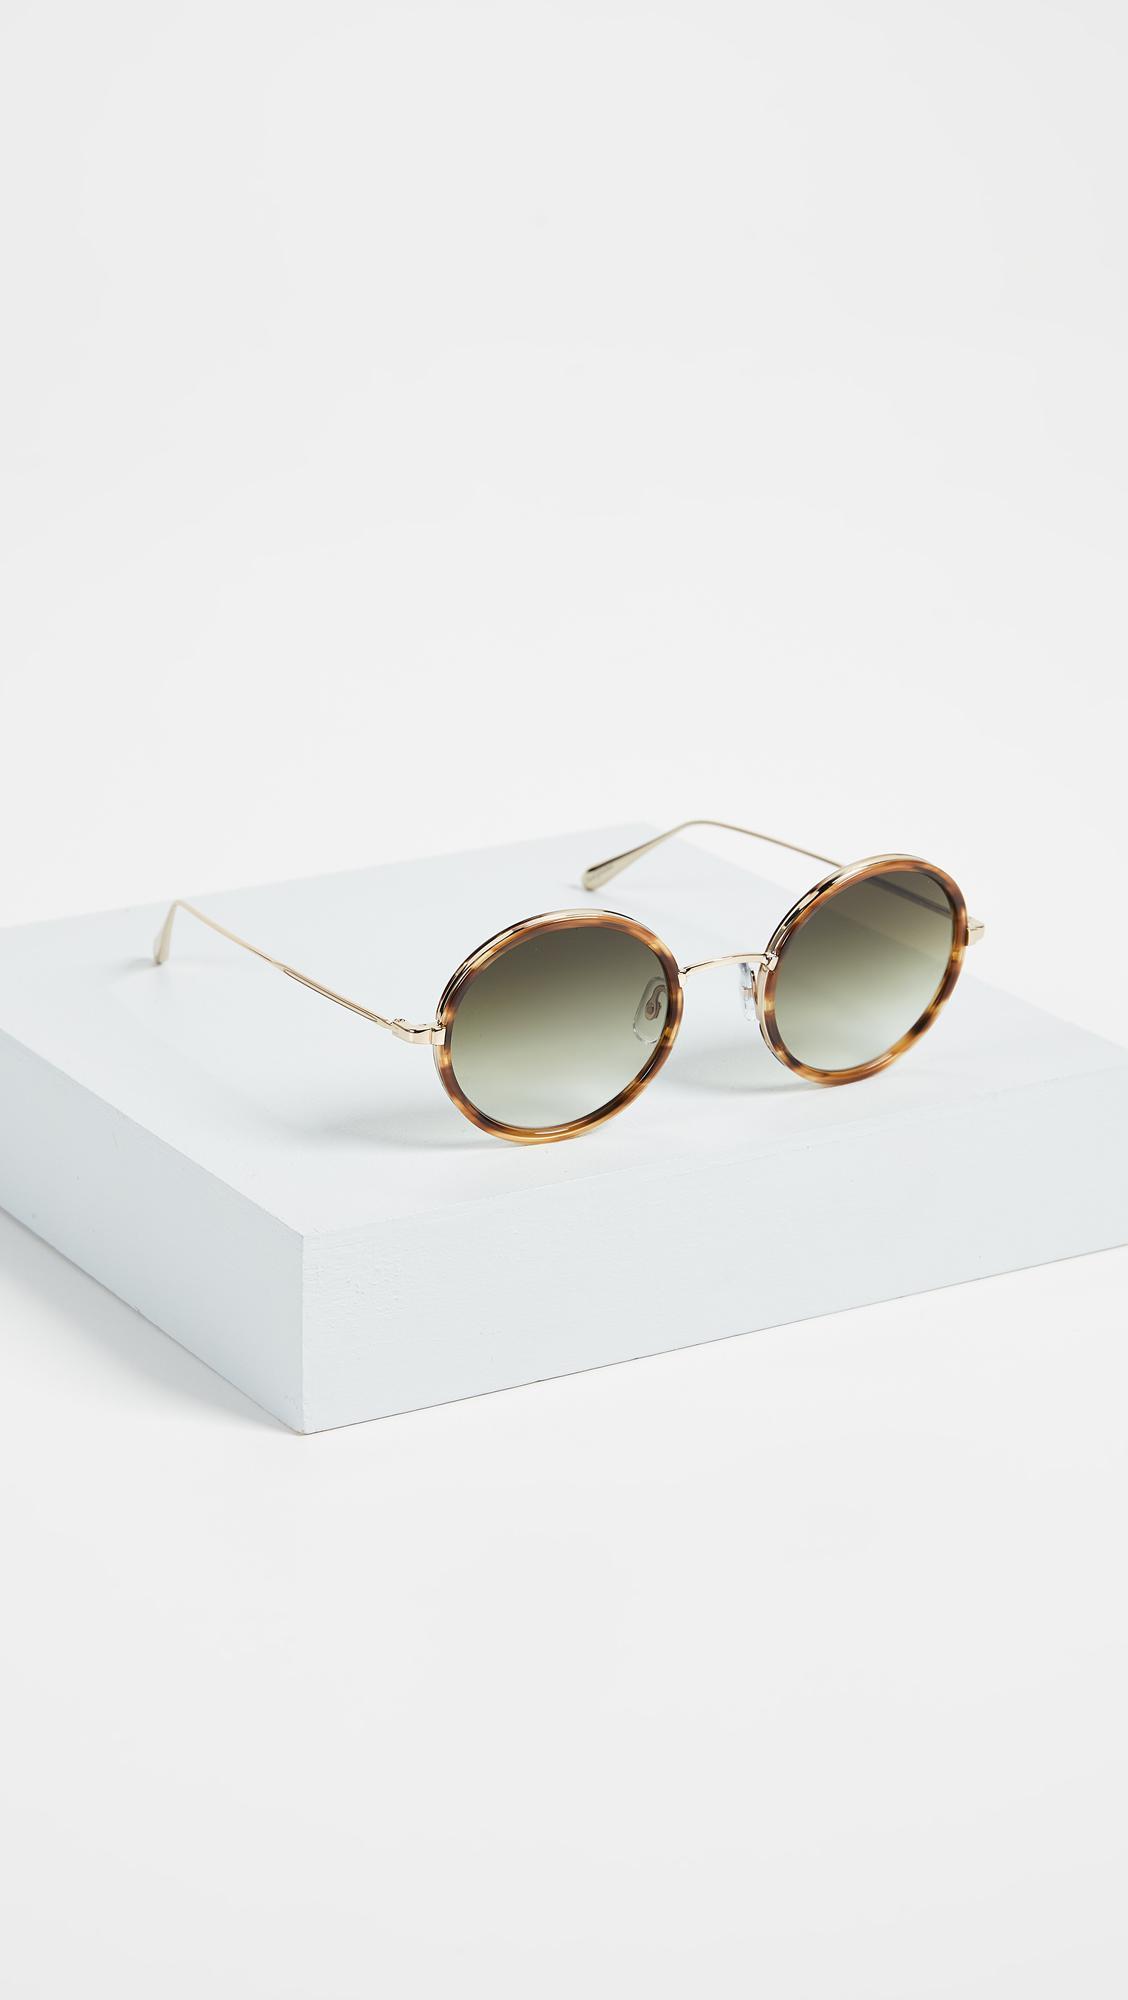 Playa 48 round-frame sunglasses Garrett Leight qC3Opy